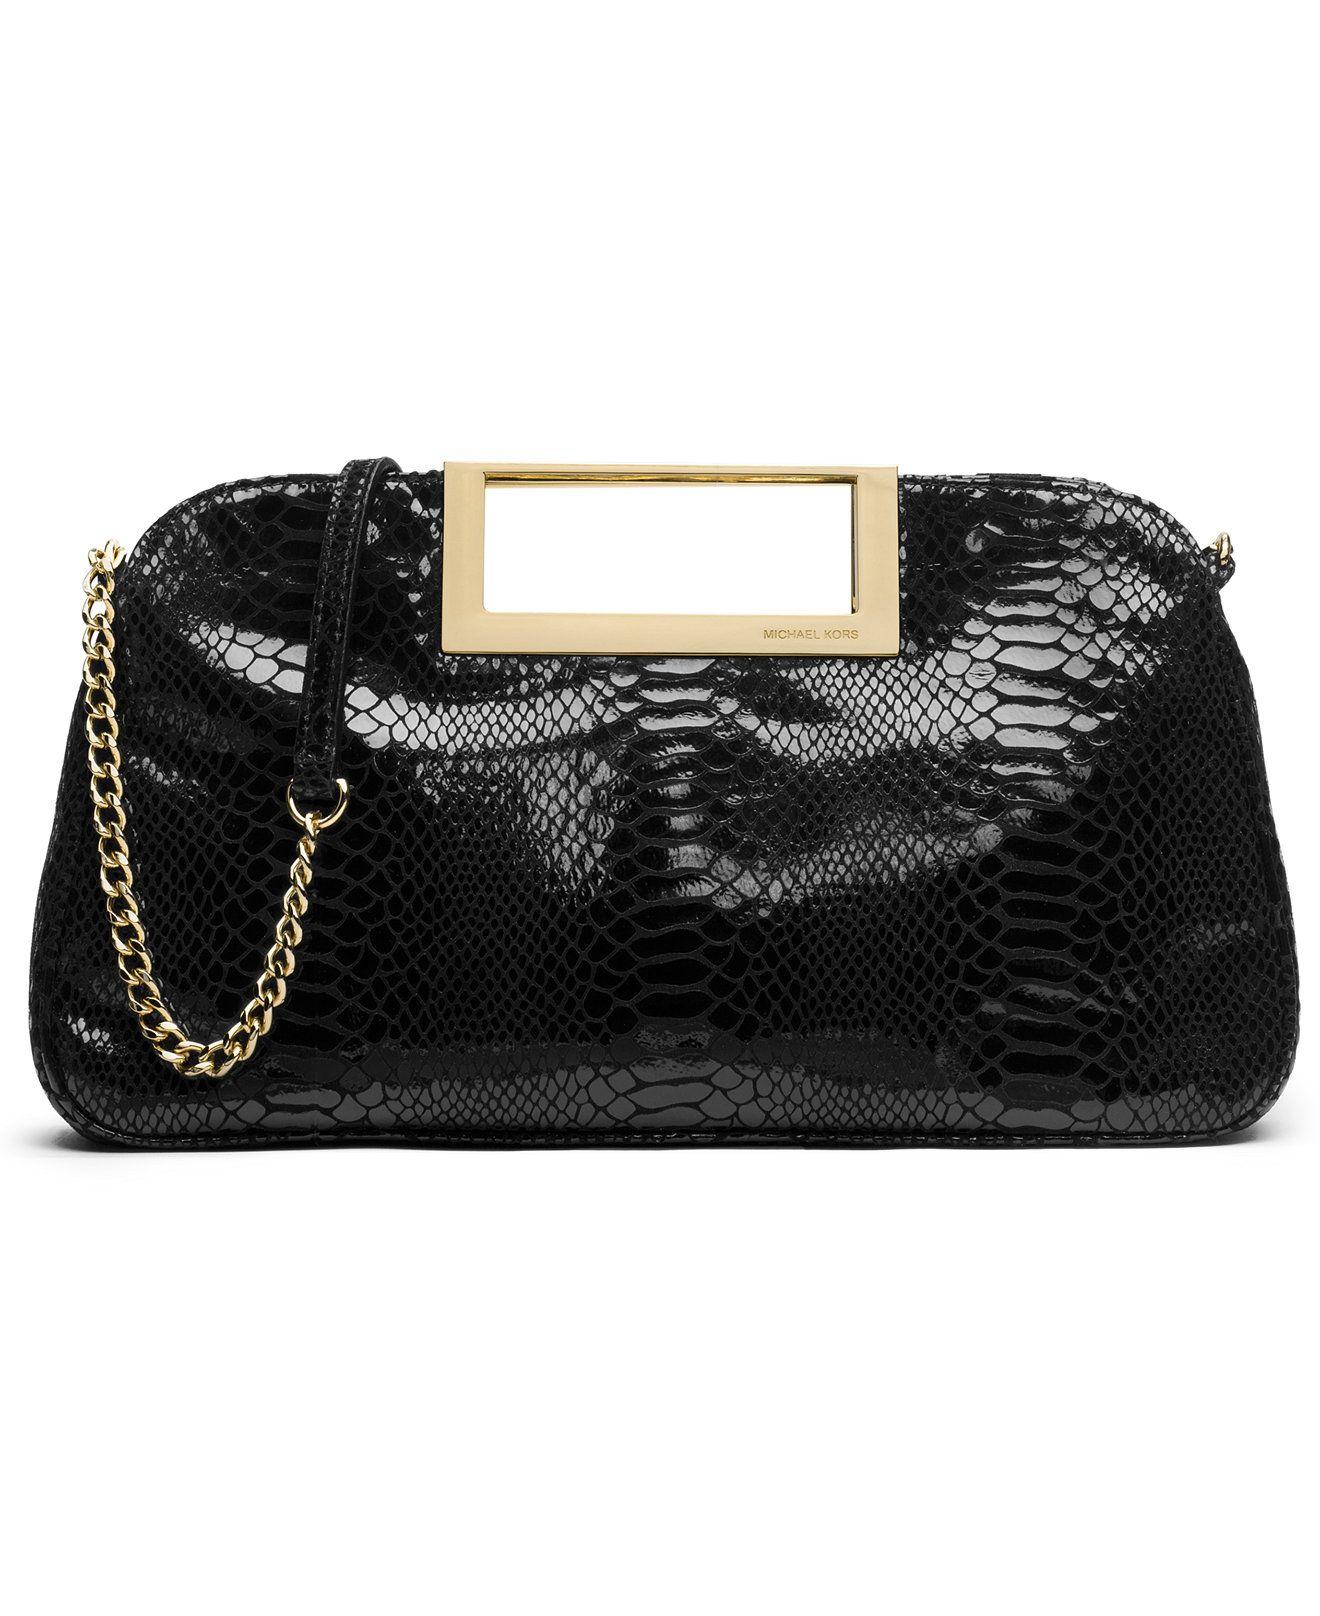 a925cfbbffd1 MICHAEL Michael Kors Berkley Large Clutch - Handbags   Accessories - Macy s